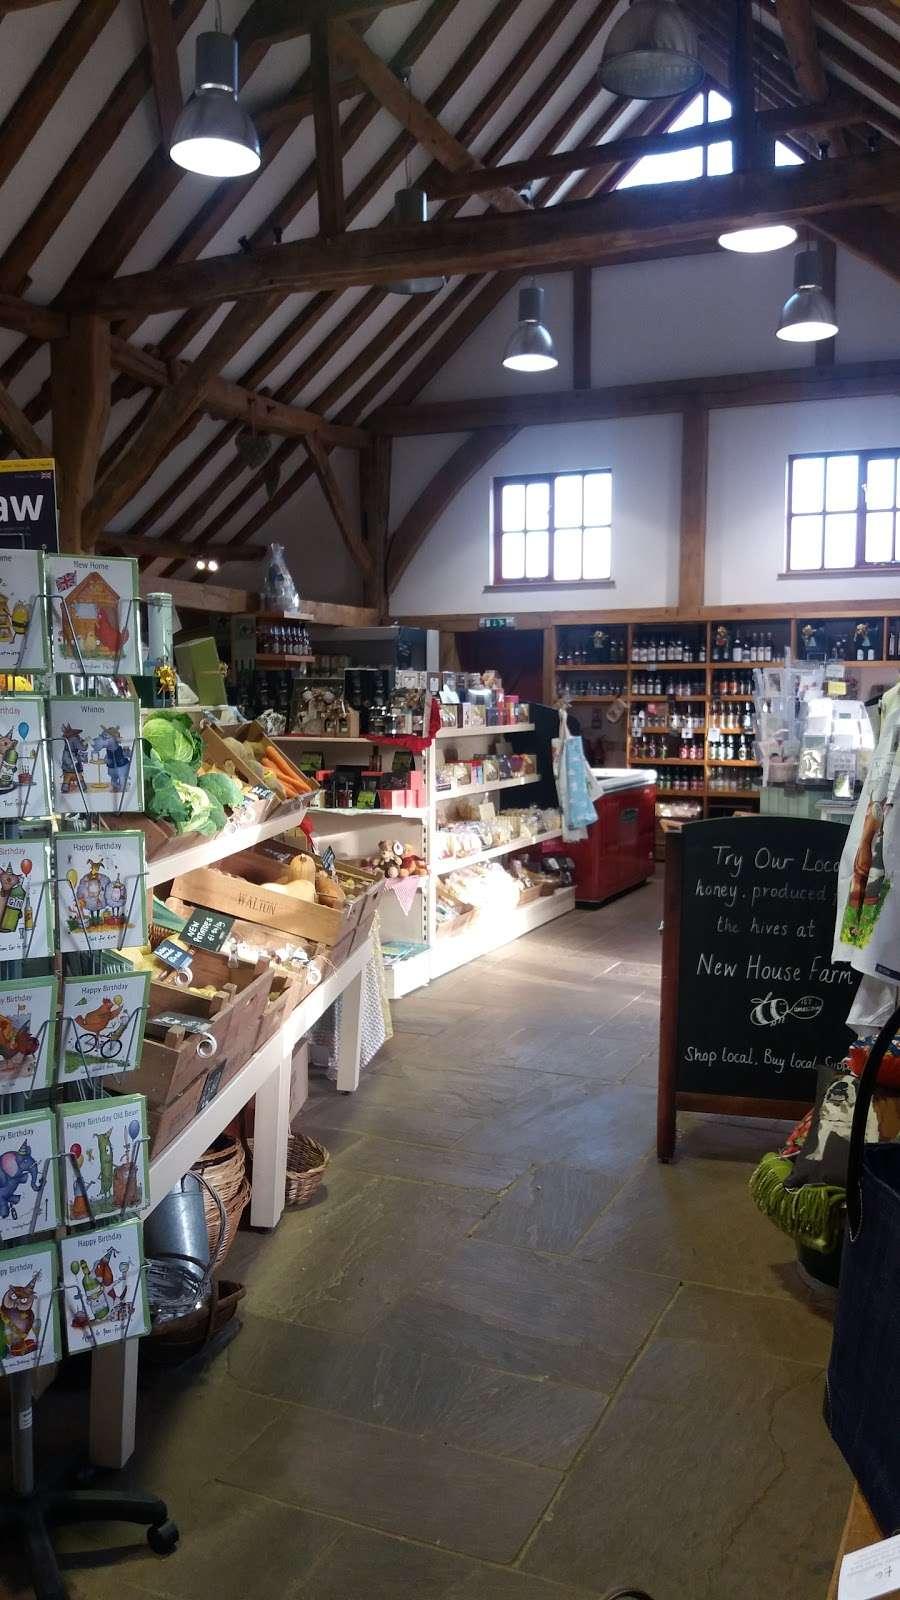 New House Farm Shop - cafe  | Photo 10 of 10 | Address: Old Crawley Rd, Faygate, Horsham RH12 4RU, UK | Phone: 01293 851890